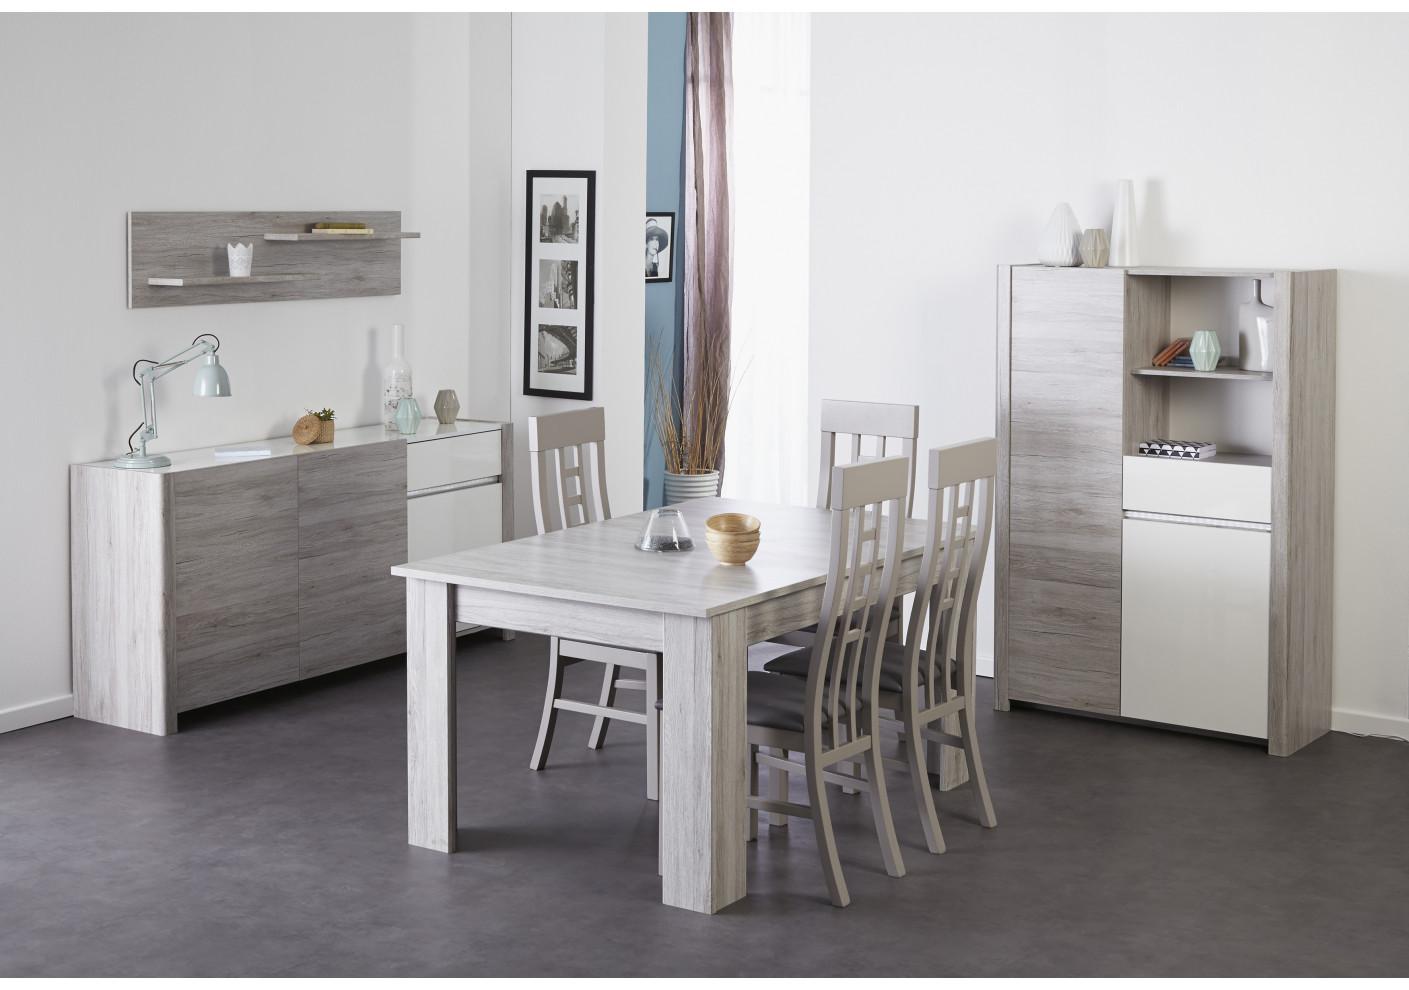 vitrine lumiled blanc brillant et gris biblioth ques s jour. Black Bedroom Furniture Sets. Home Design Ideas